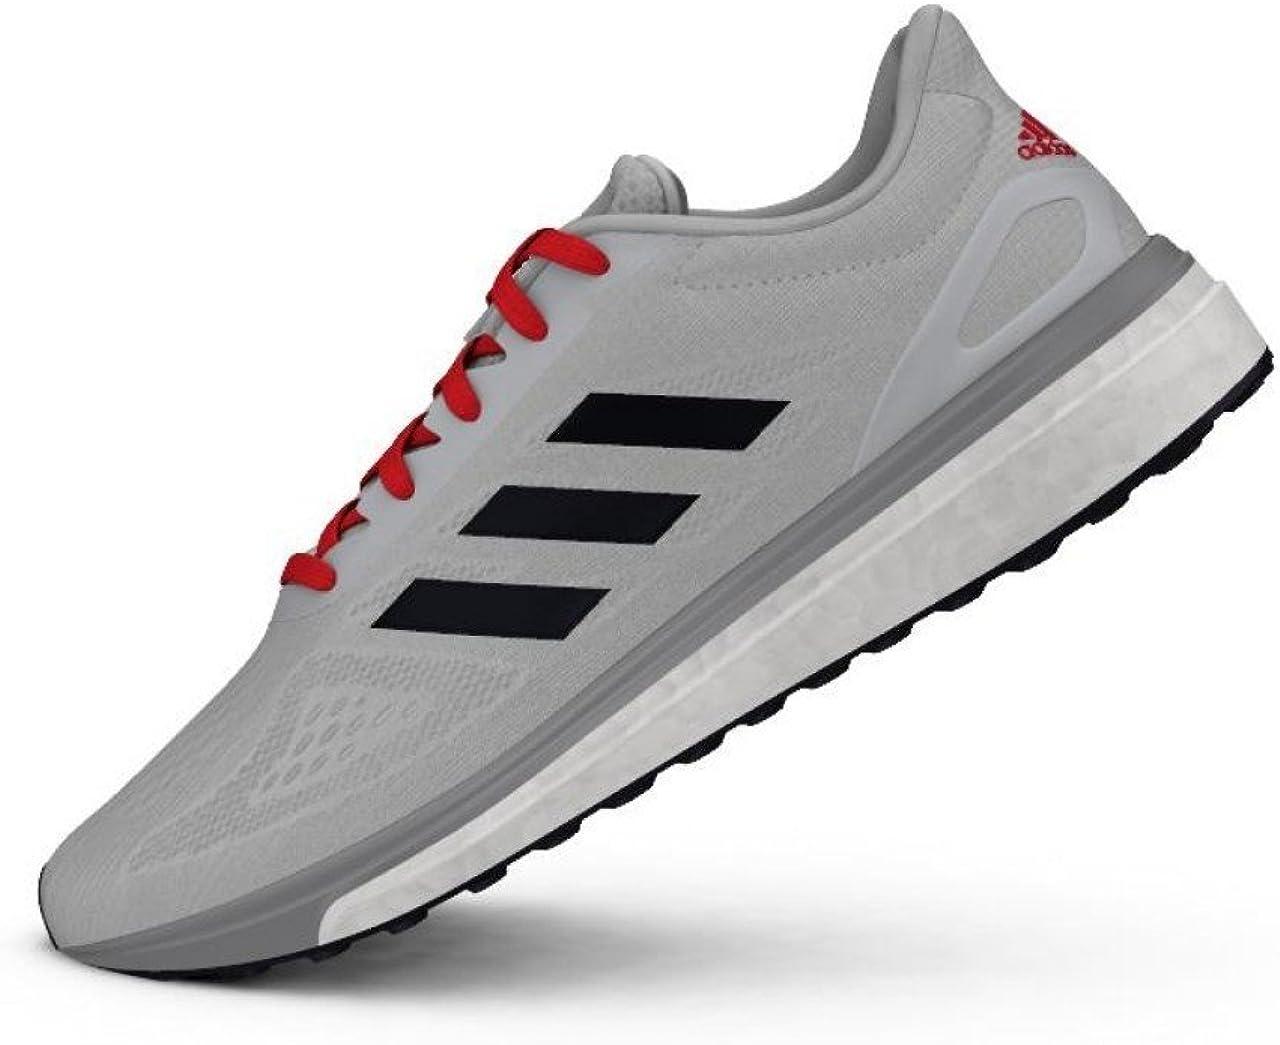 adidas Response Lt W, Zapatillas de Running para Mujer, Naranja (Corsen/Corsen/Tinley), 46 EU: Amazon.es: Zapatos y complementos